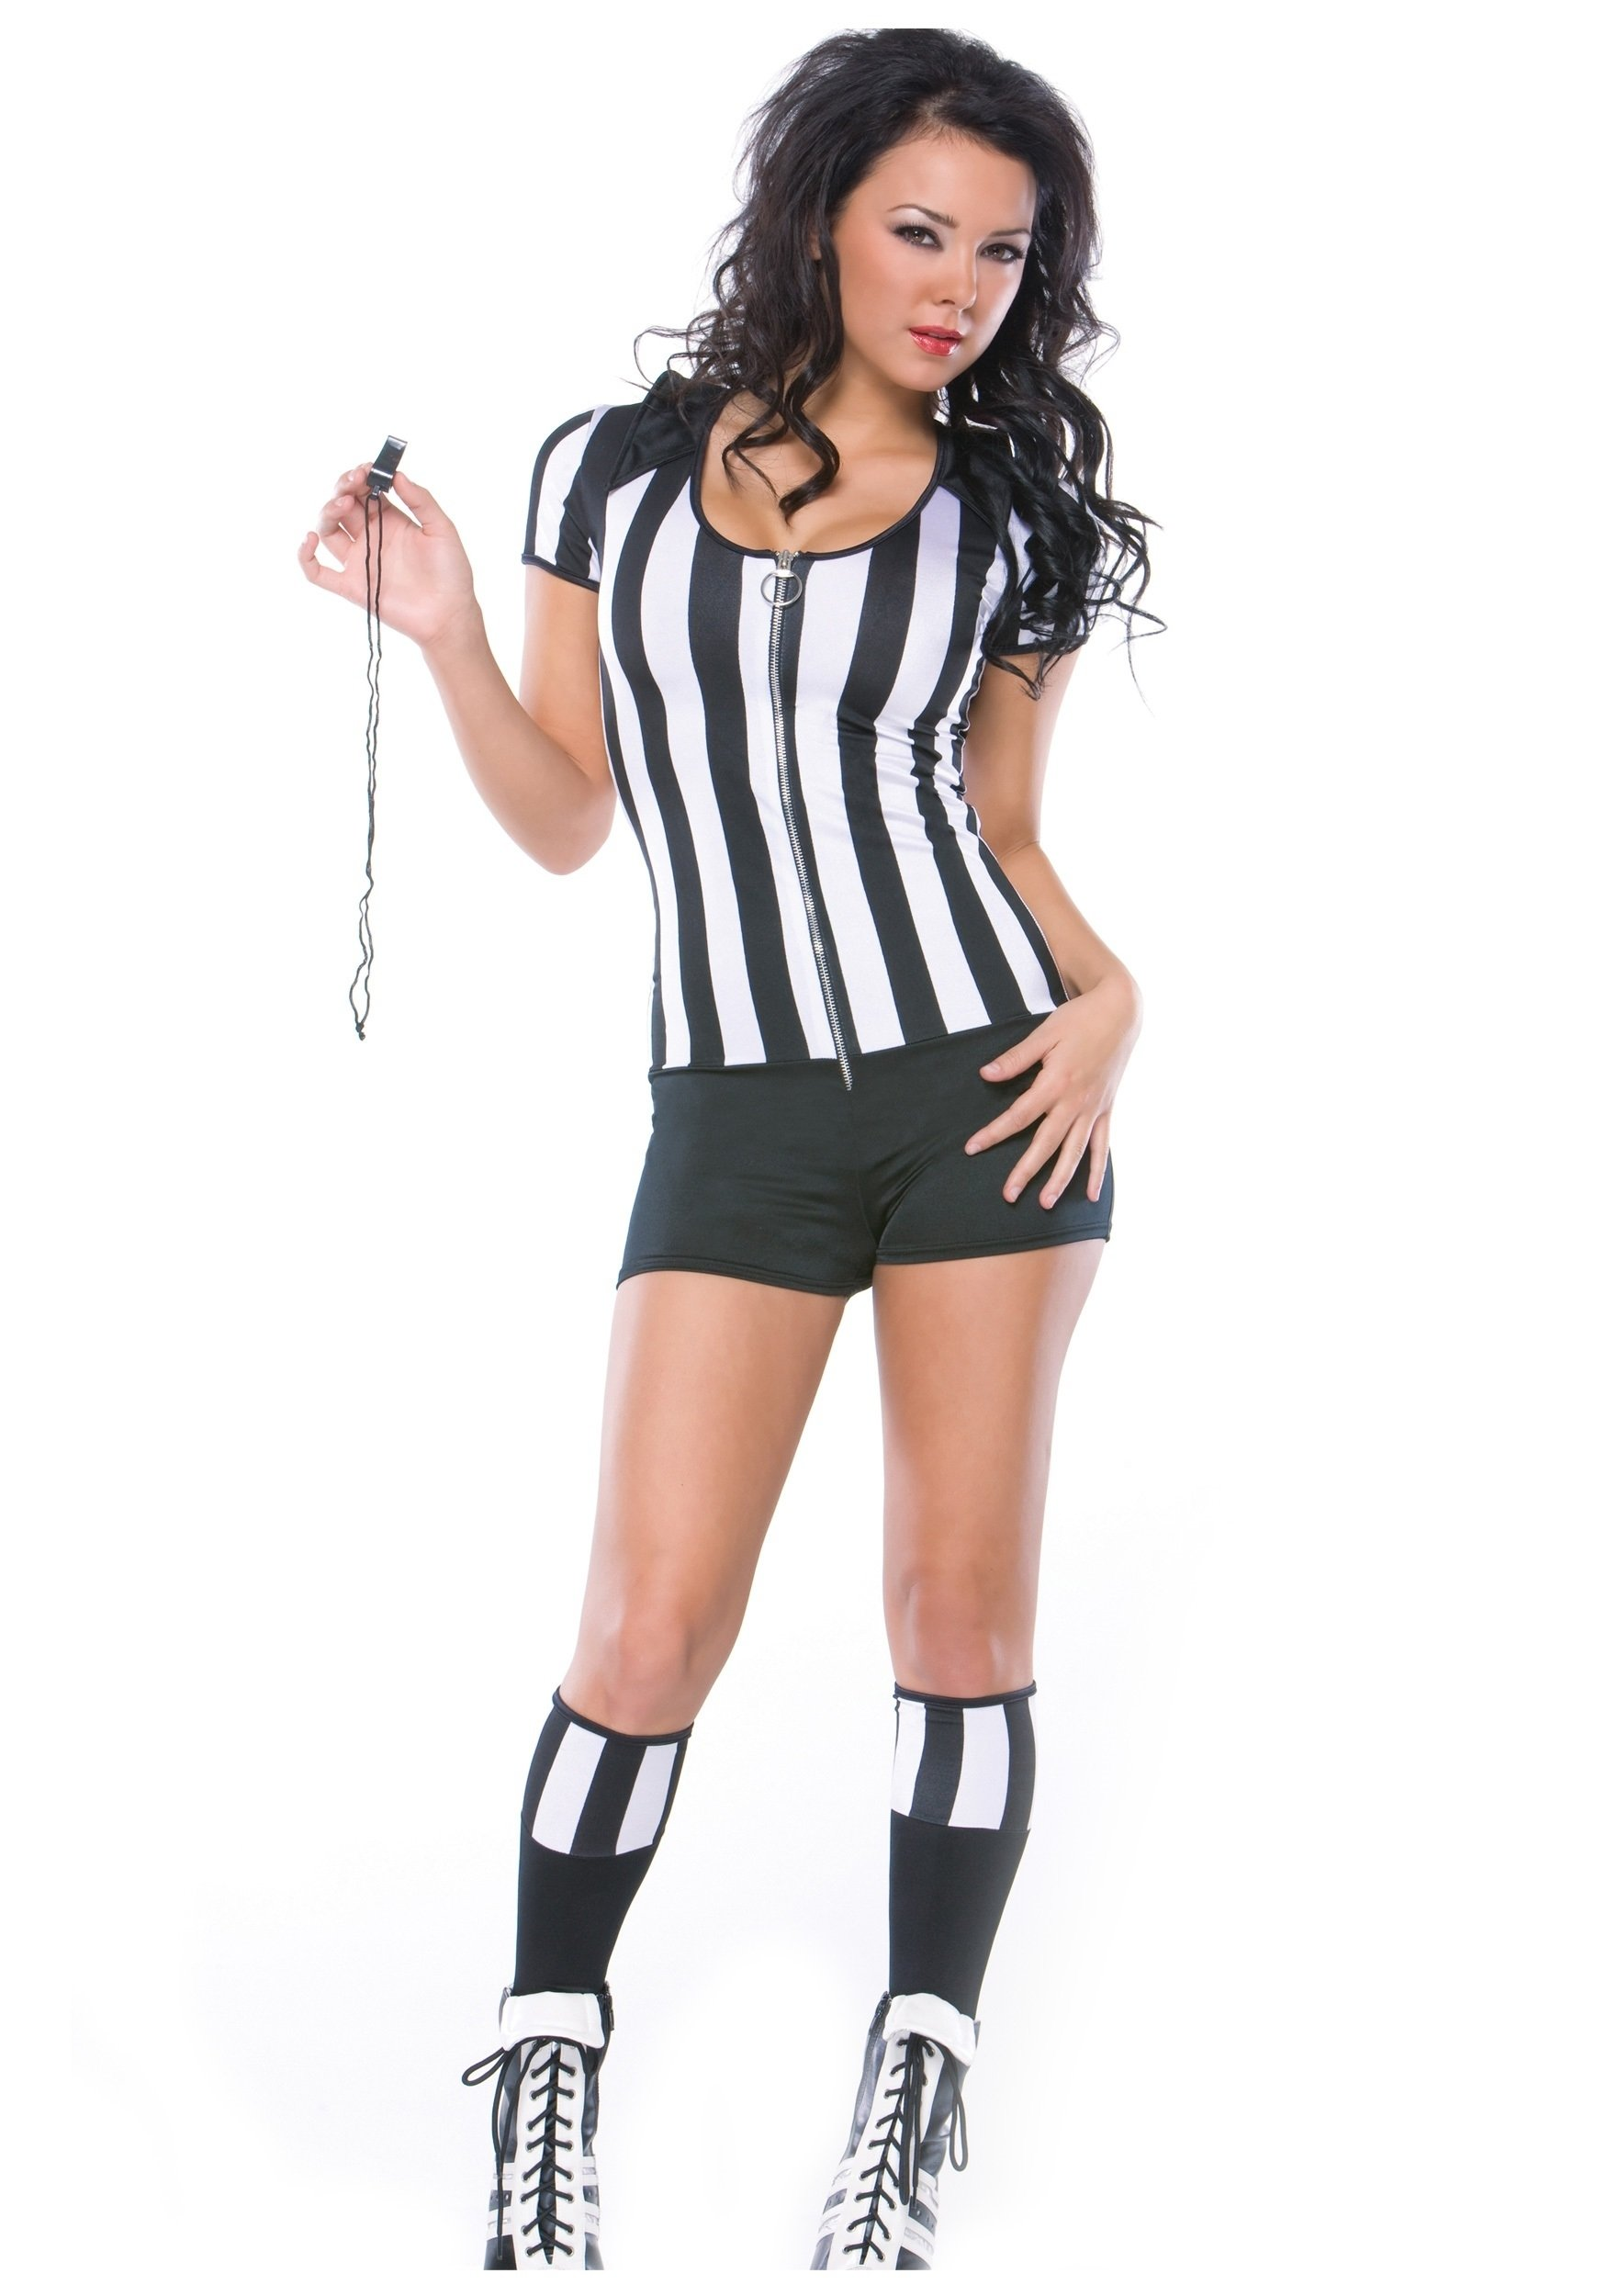 10 Stunning Halloween Costumes For Women Ideas time out referee costume halloween costume ideas 2016 2020